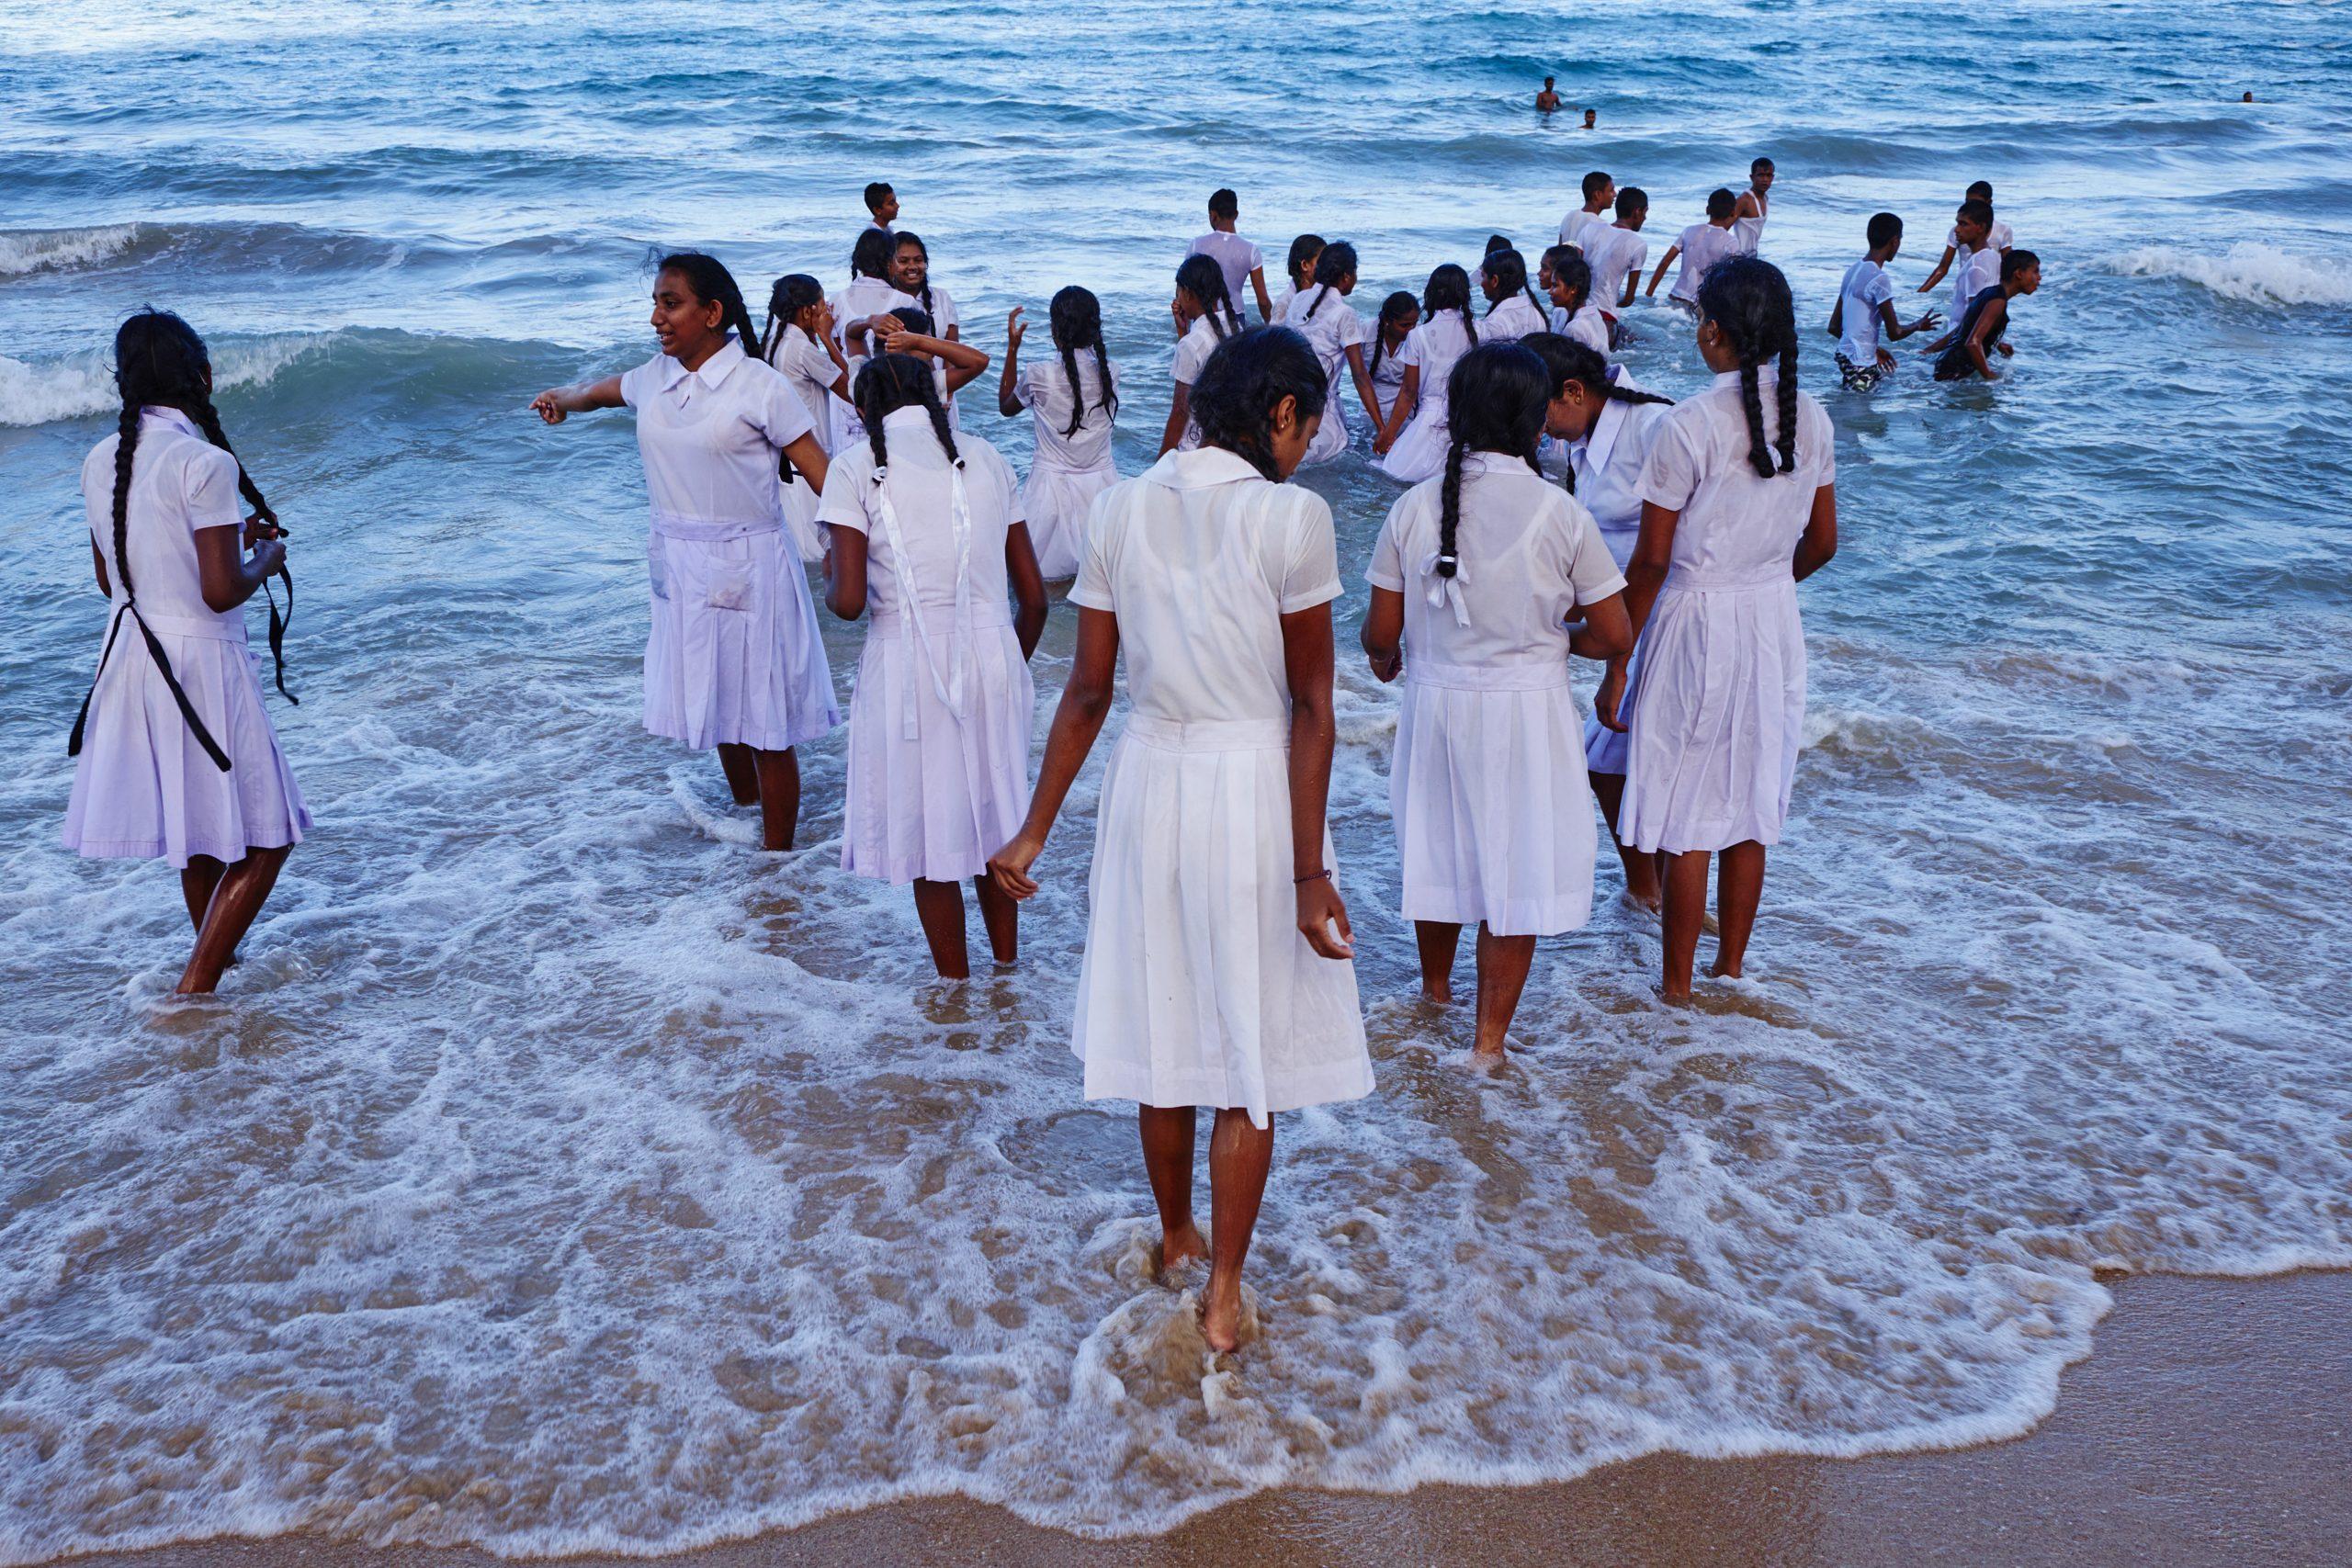 Sri Lanka, Trincomalee, shcool girls play on the sea